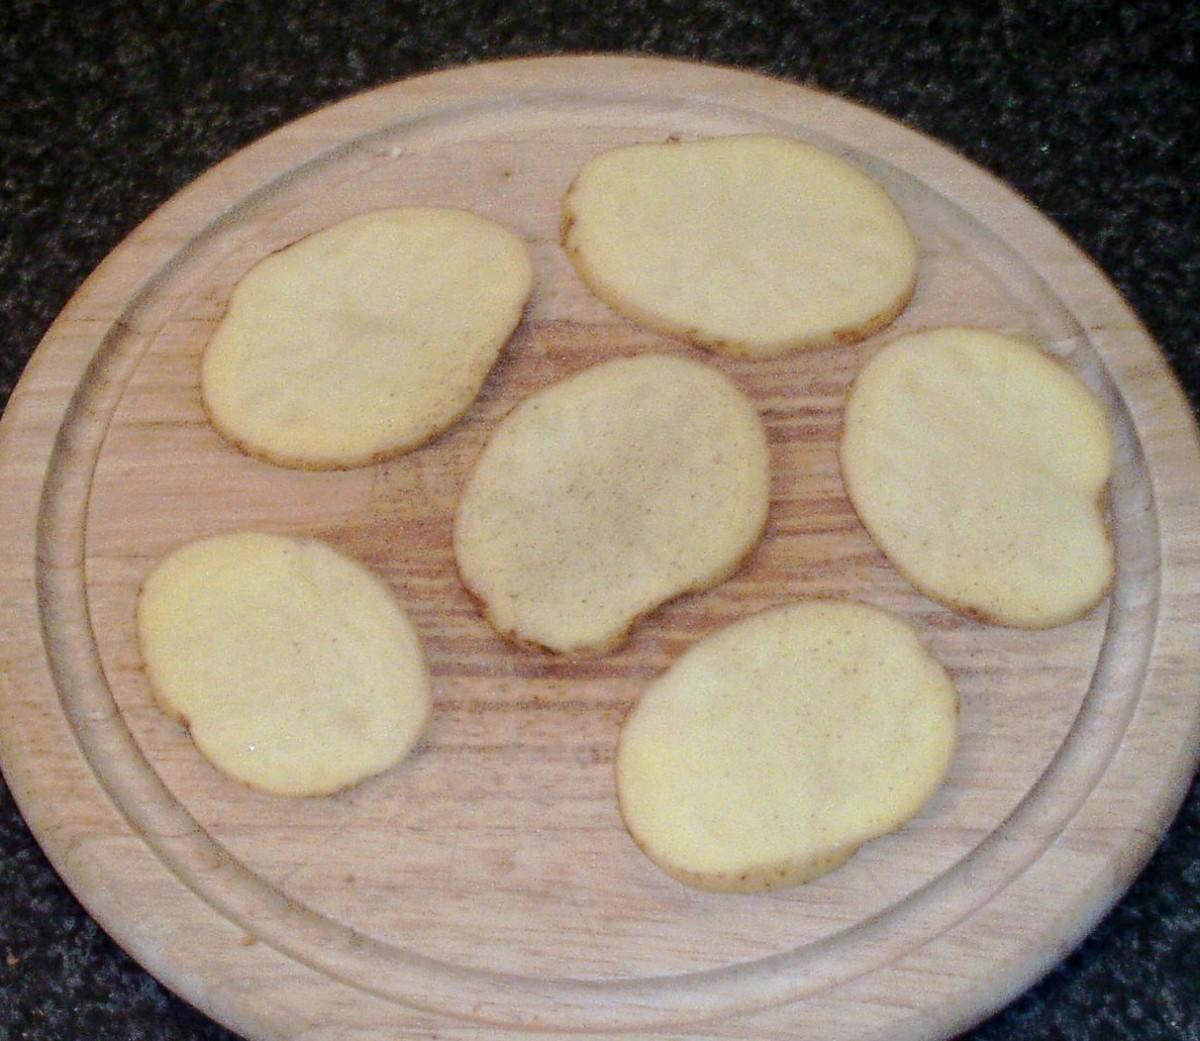 Potato slices are seasoned